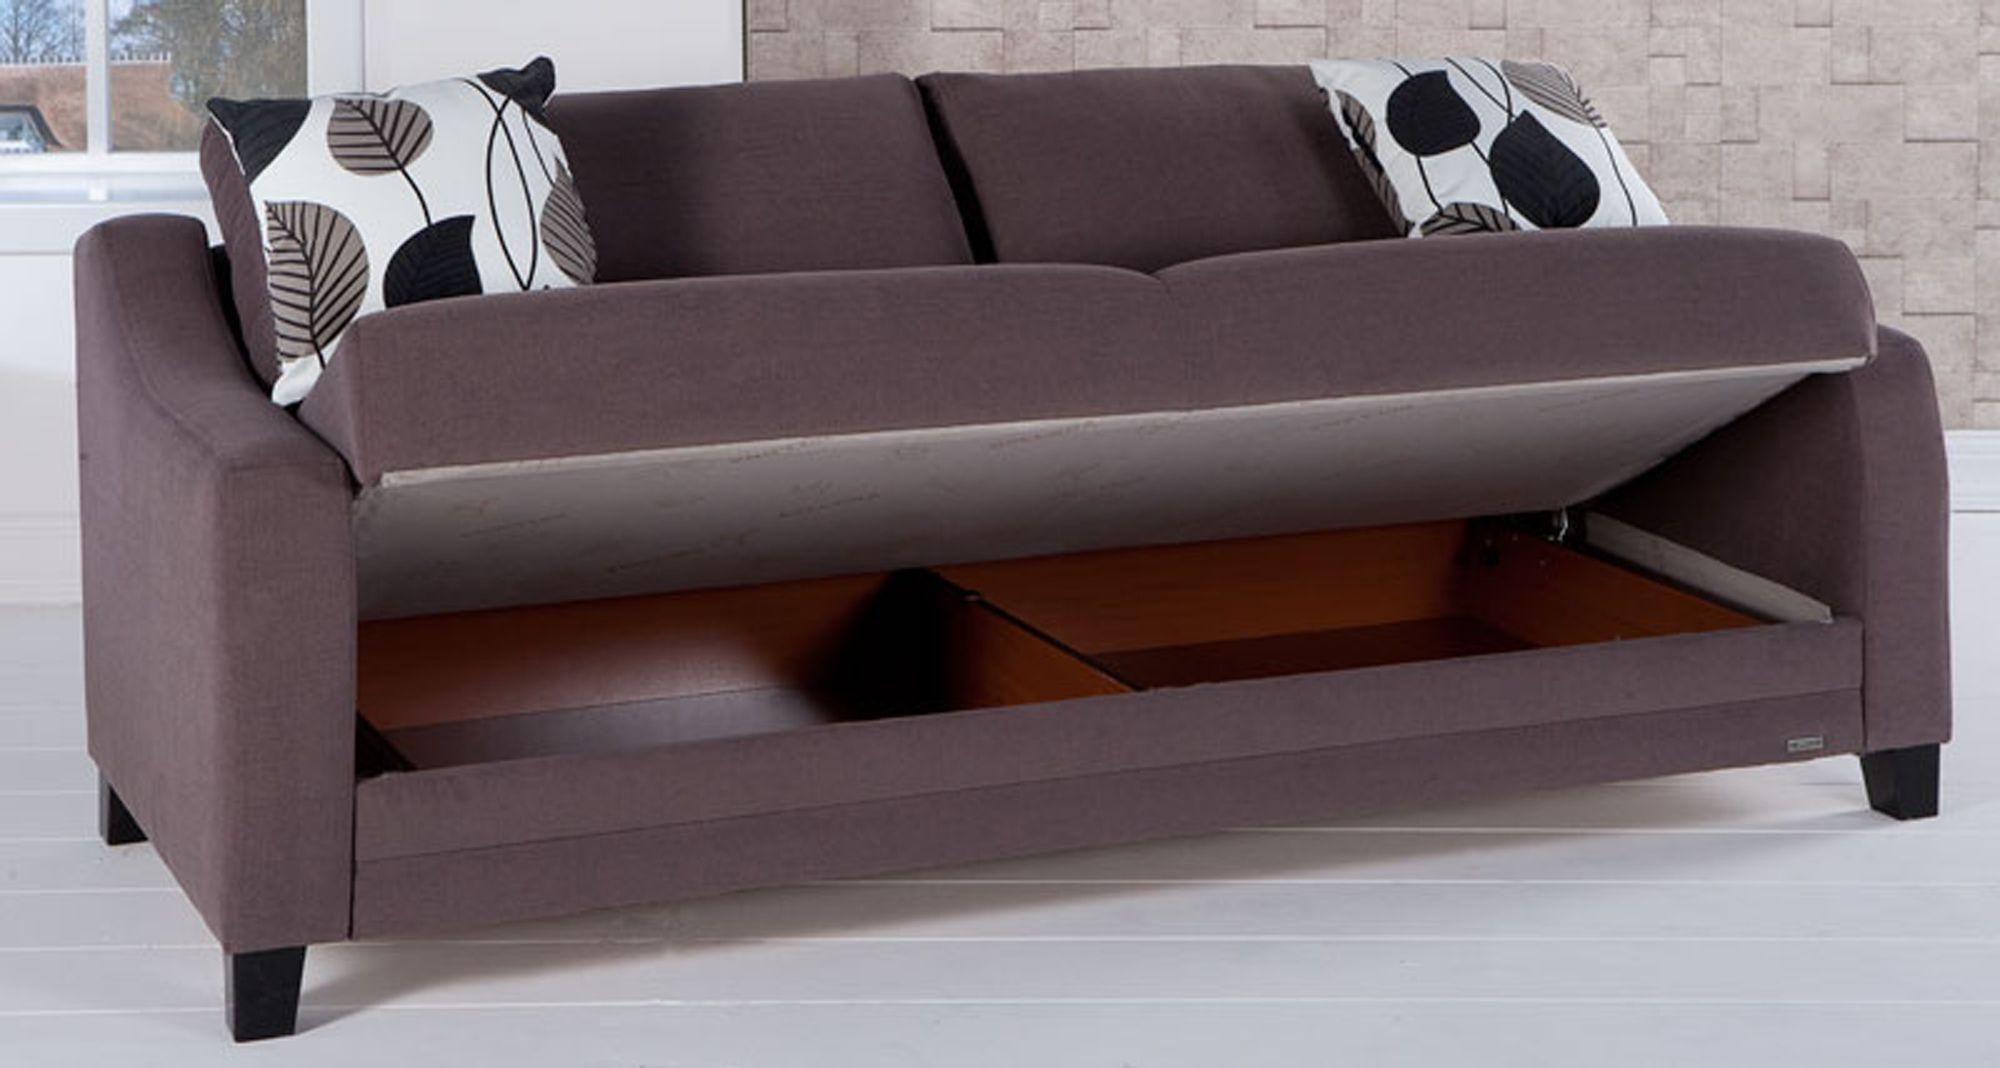 denver futon and mattress   futons and fold out beds   pinterest   futons denver futons in denver   furniture shop  rh   ekonomikmobilyacarsisi